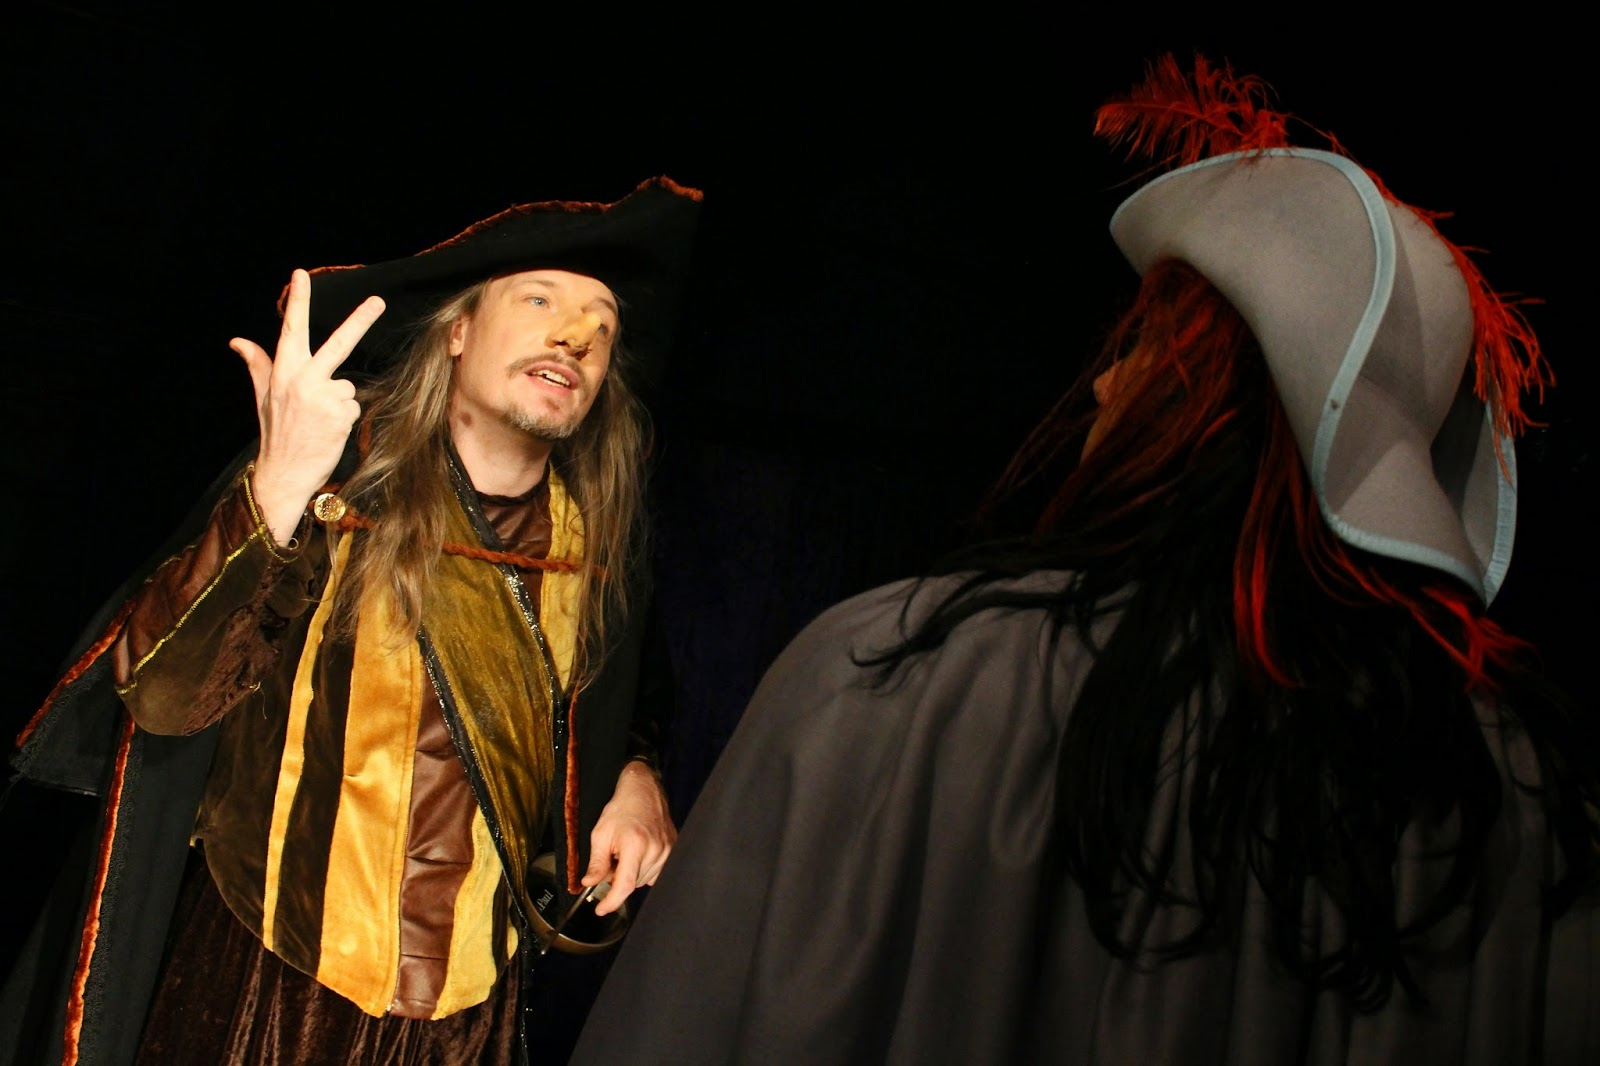 Cyrano de Bergerac, tirade des nez - Compagnie Michel B